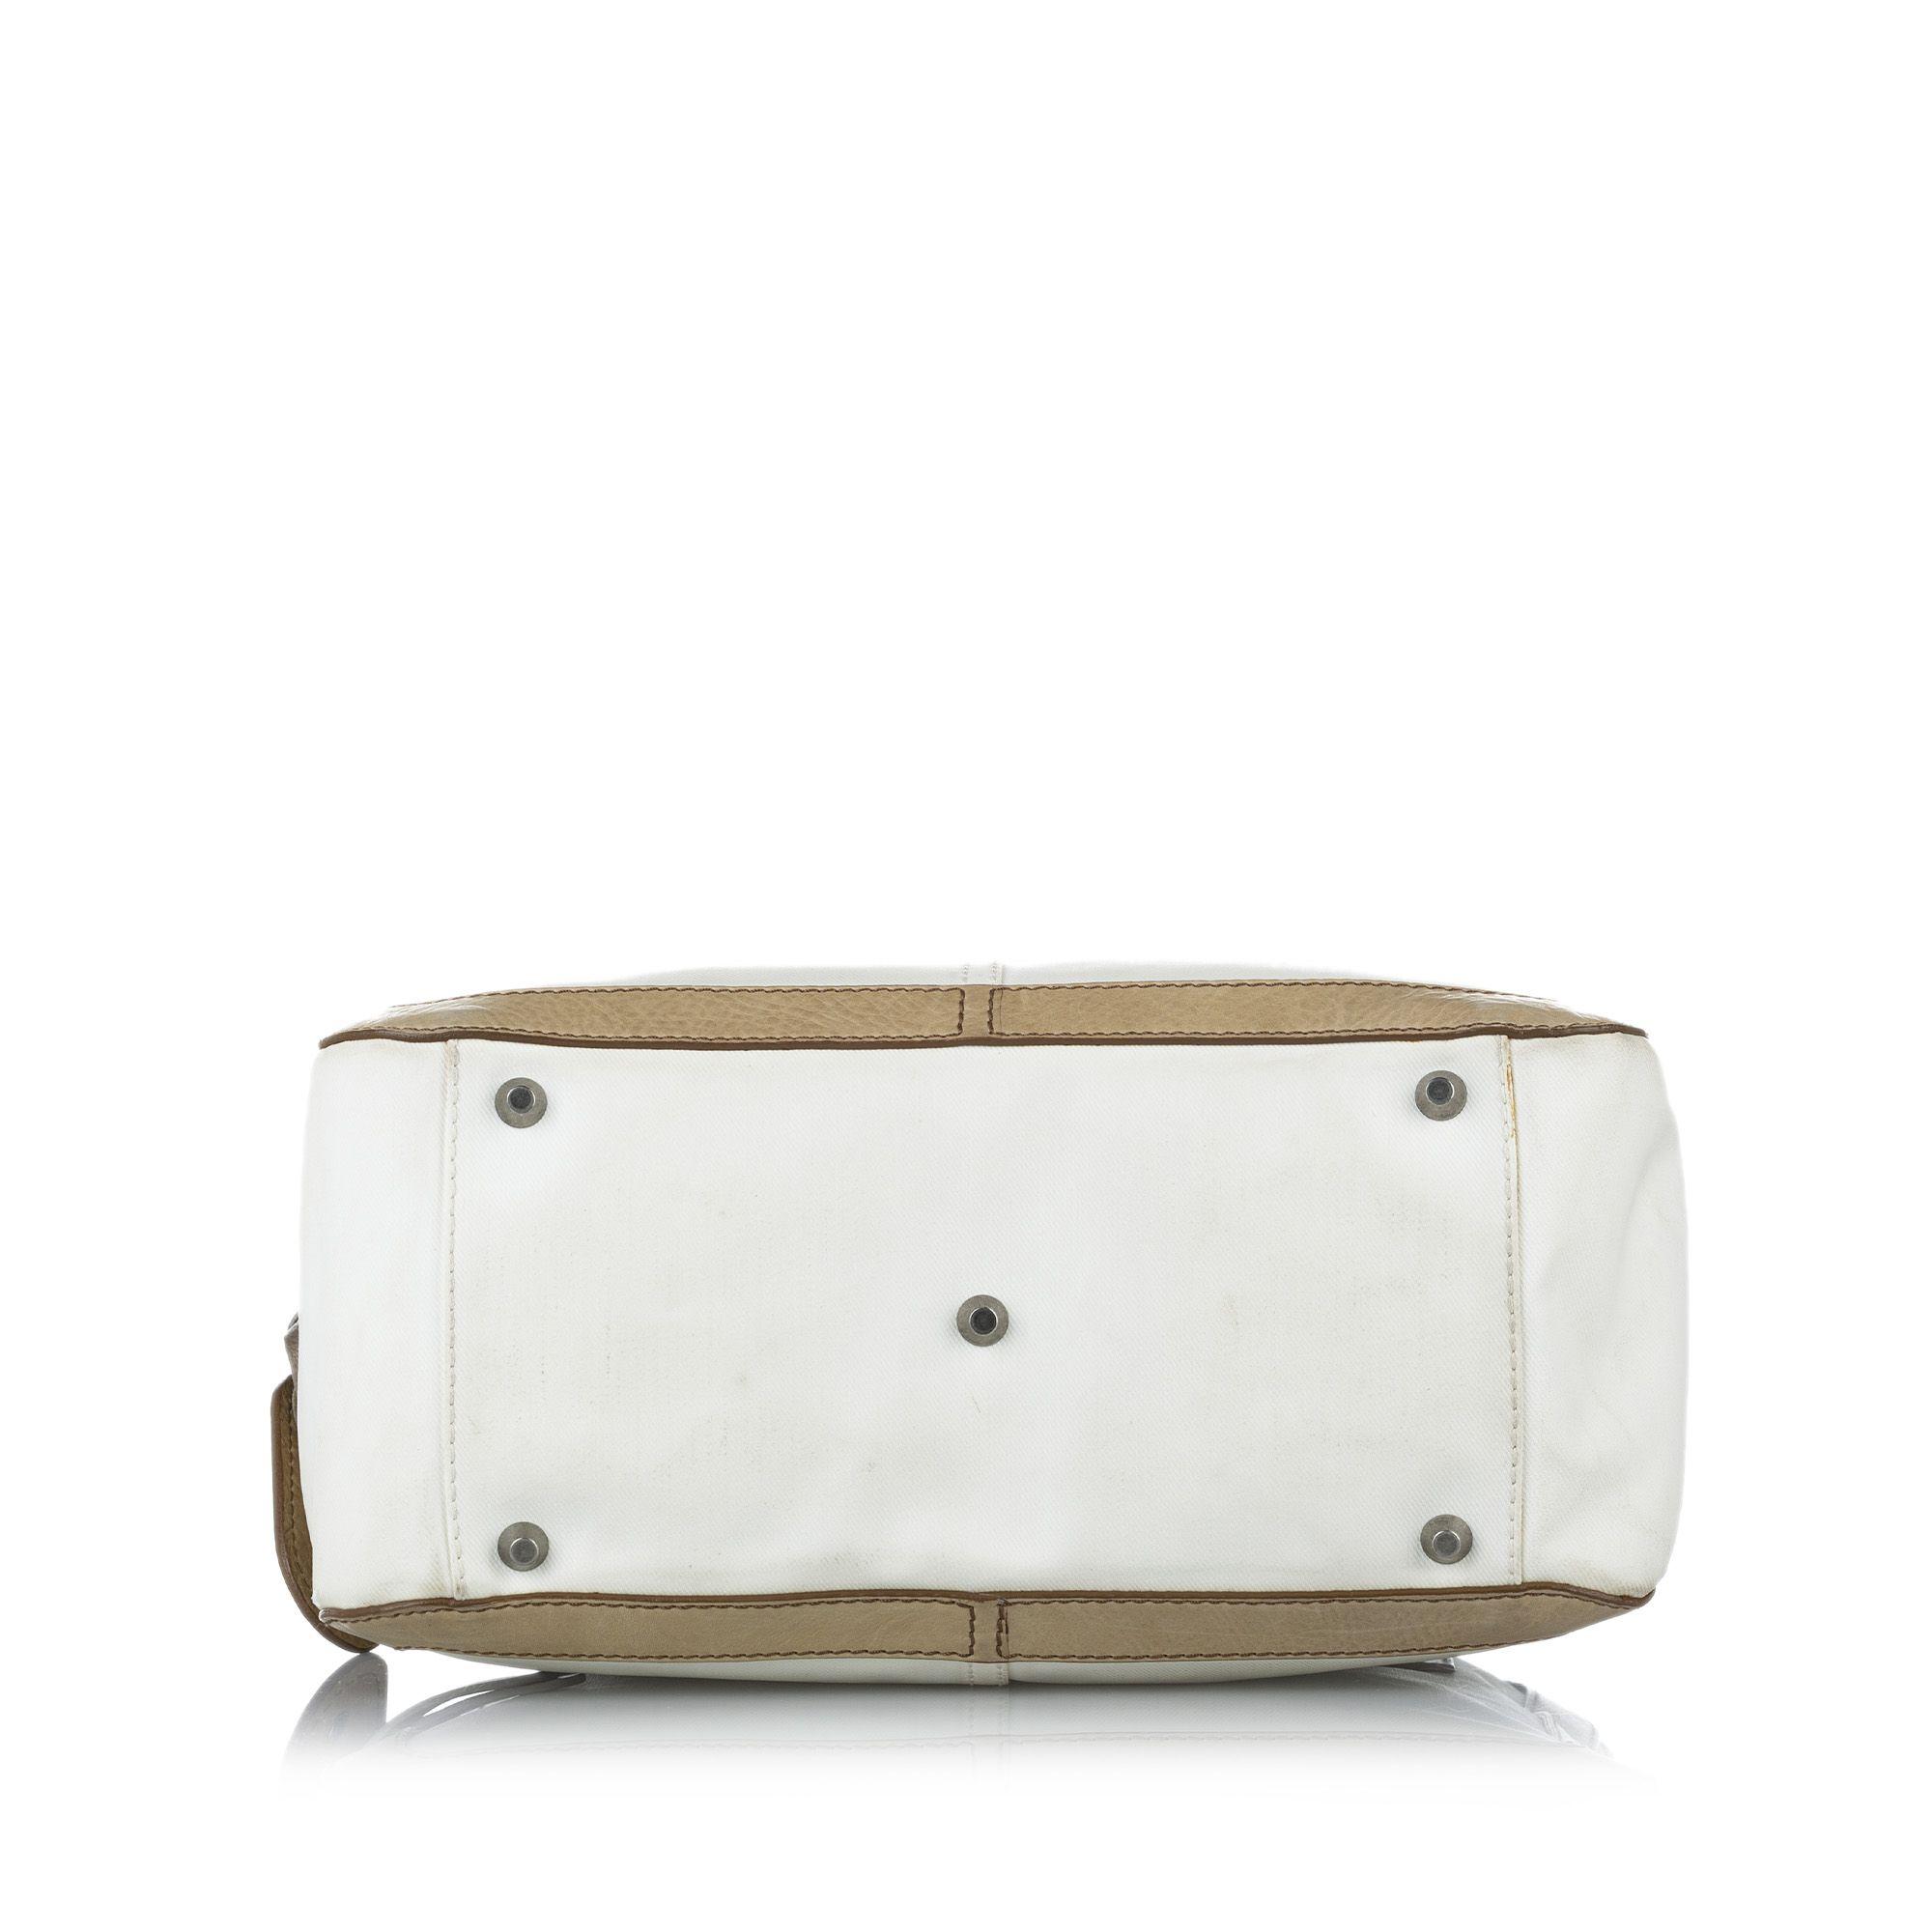 Vintage Chloe Leather Handbag White